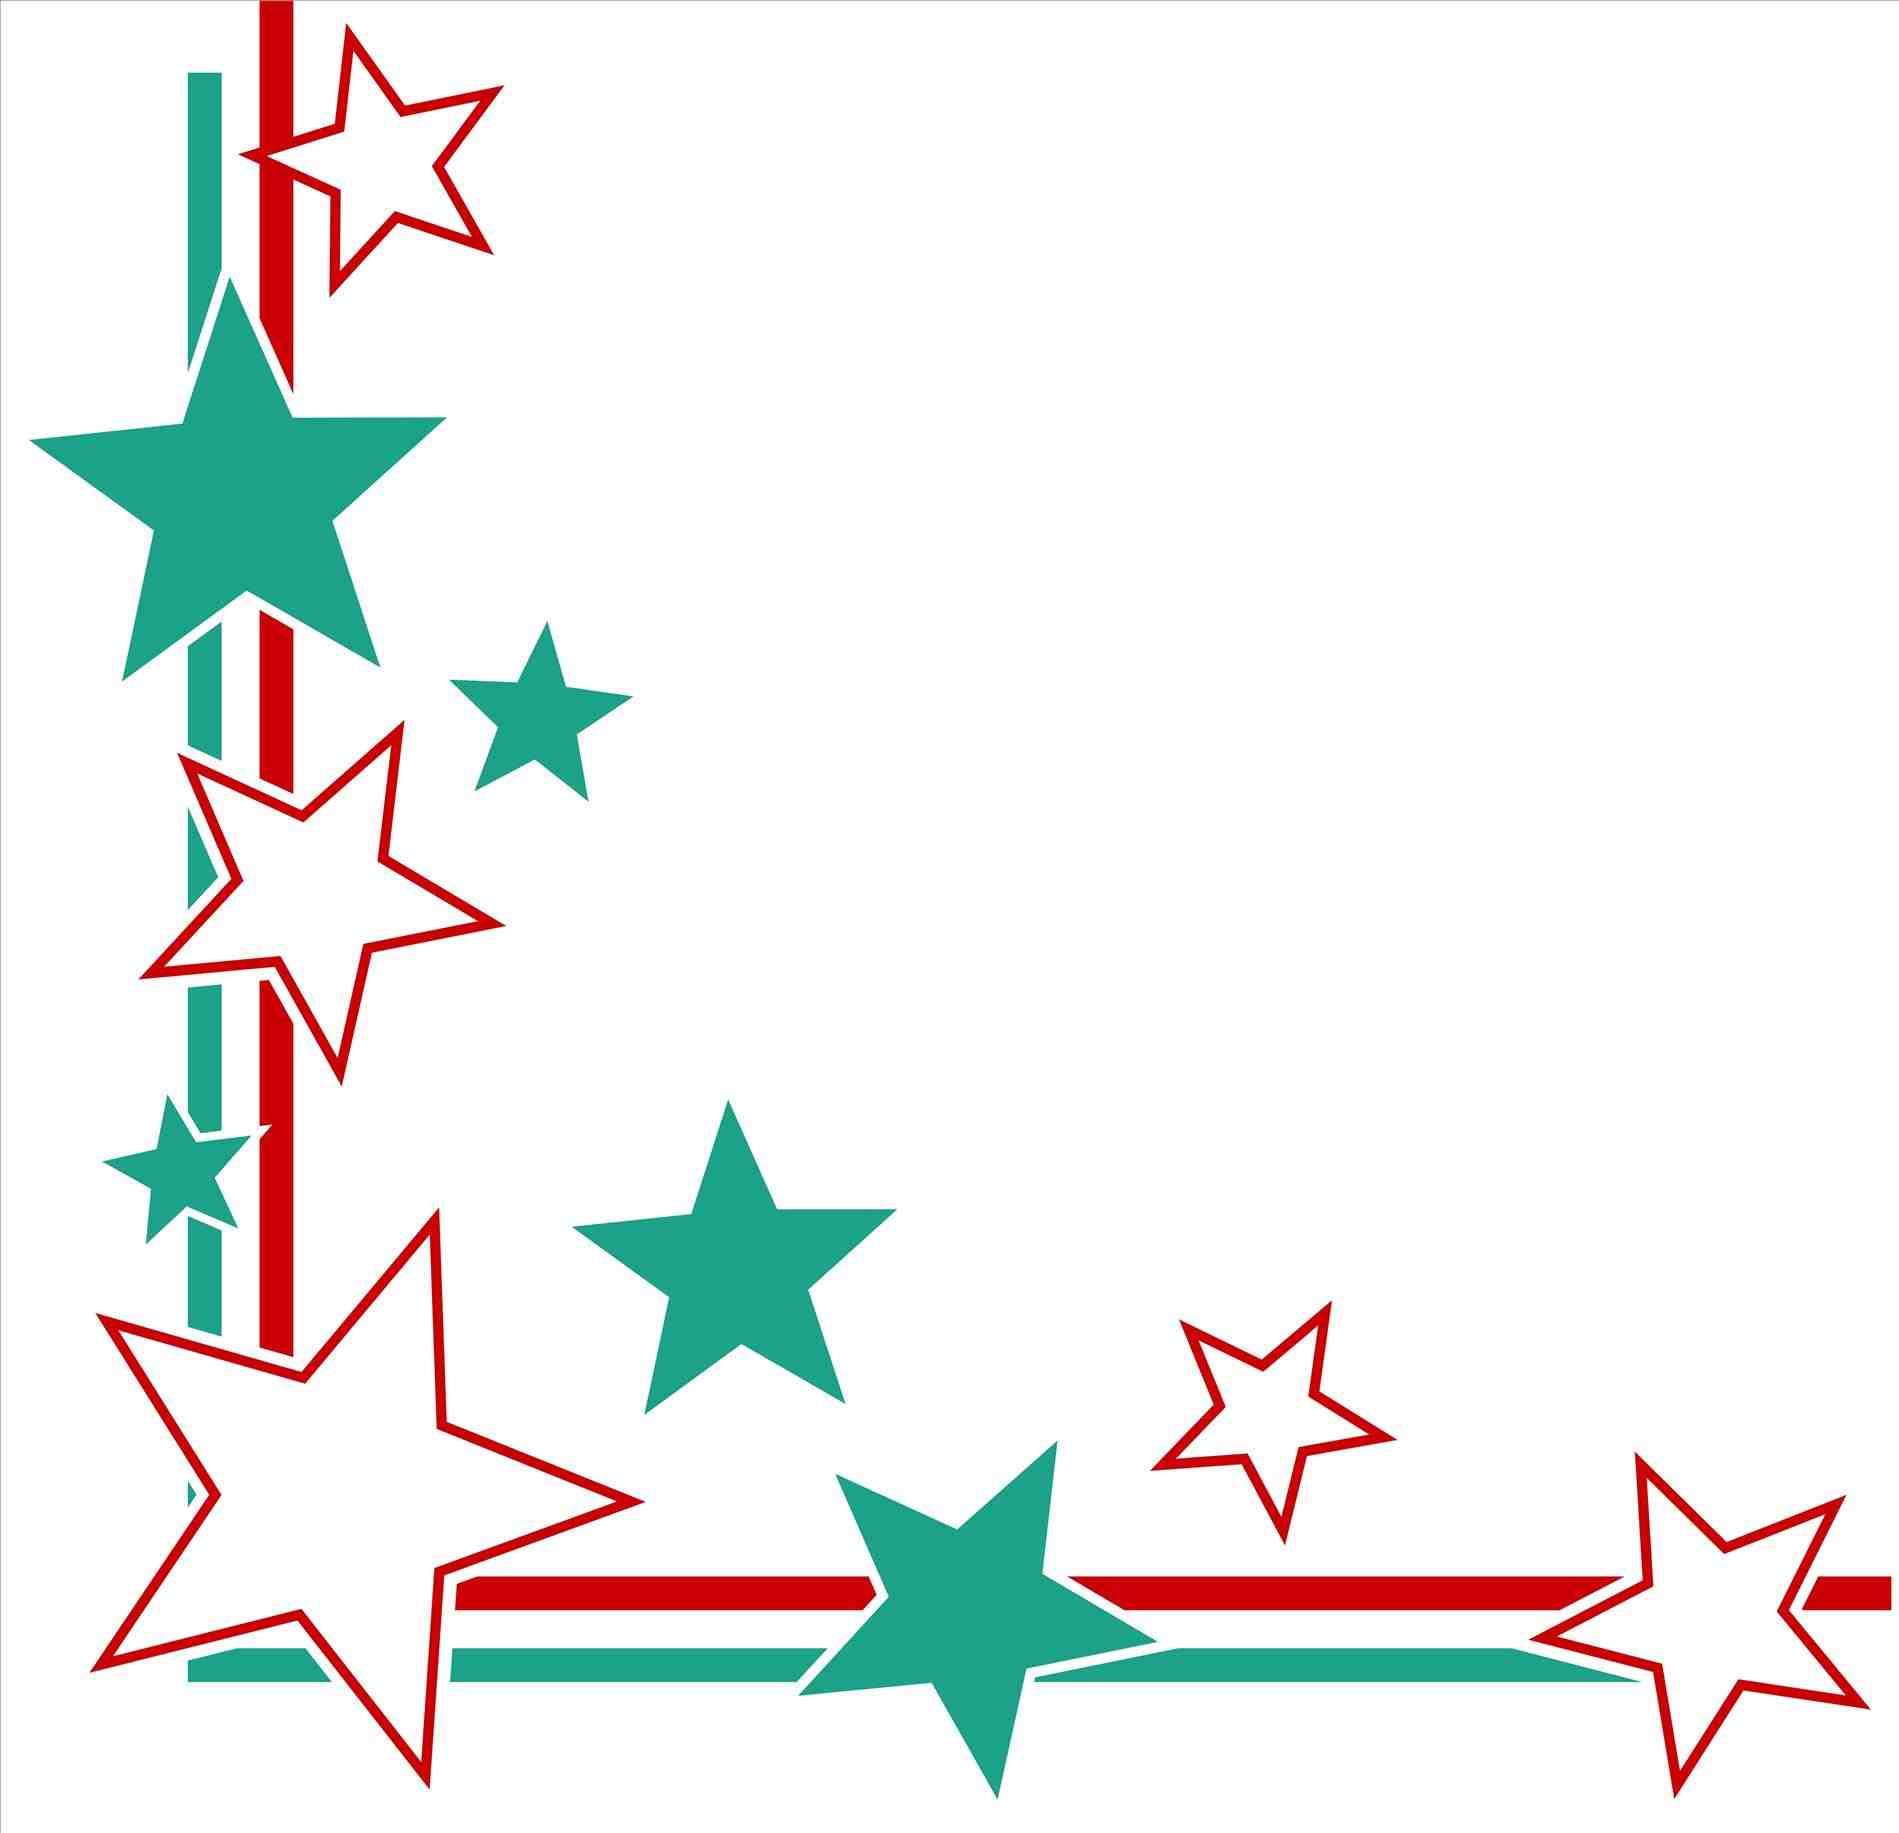 1899x1833 Christmas Corner Border Clip Art Free Cheminee.website